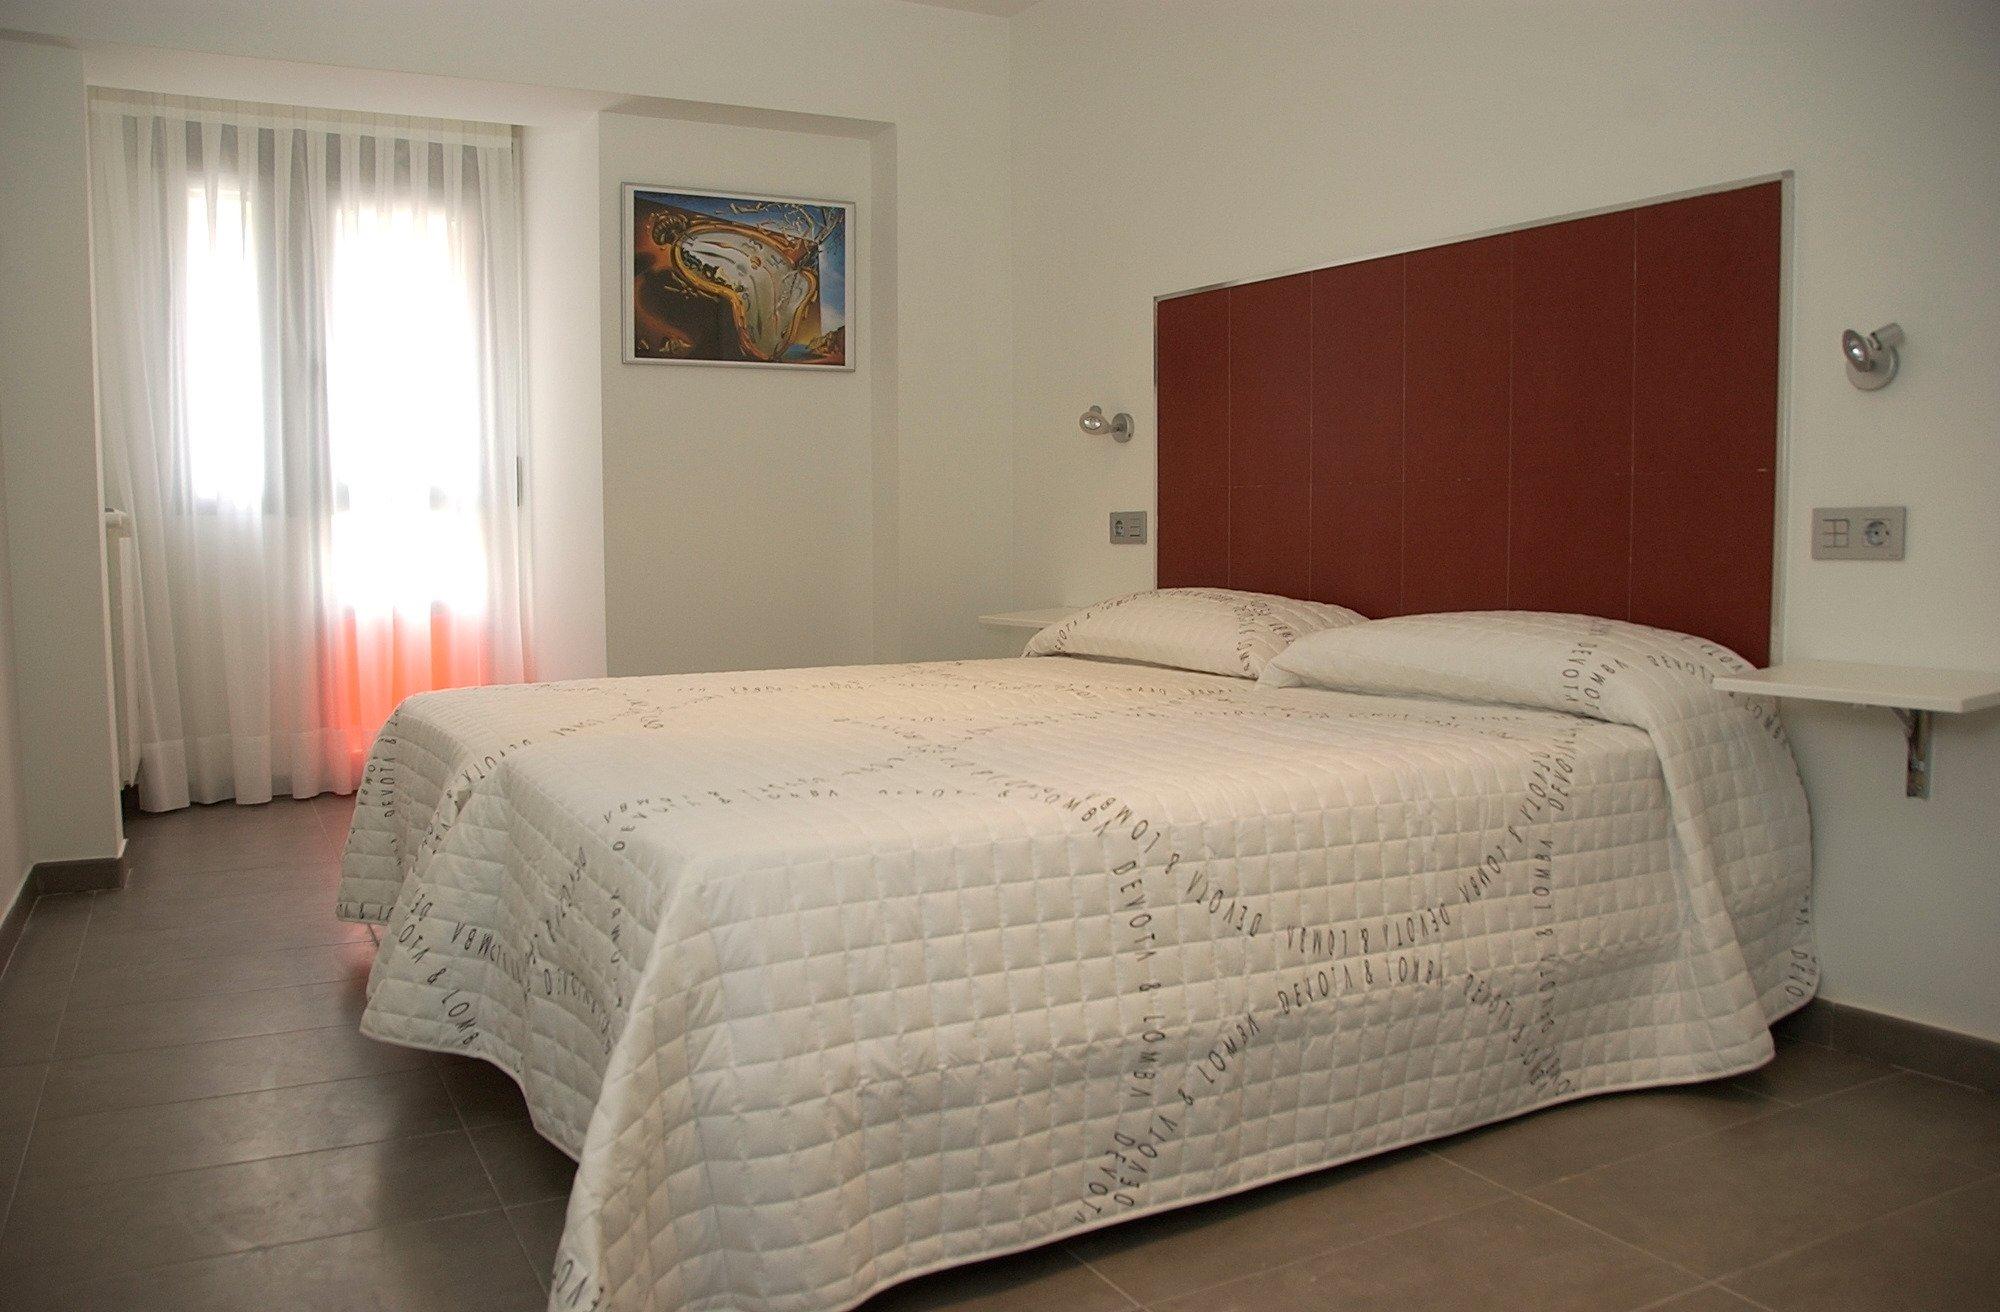 Sercotel Hostel Soria